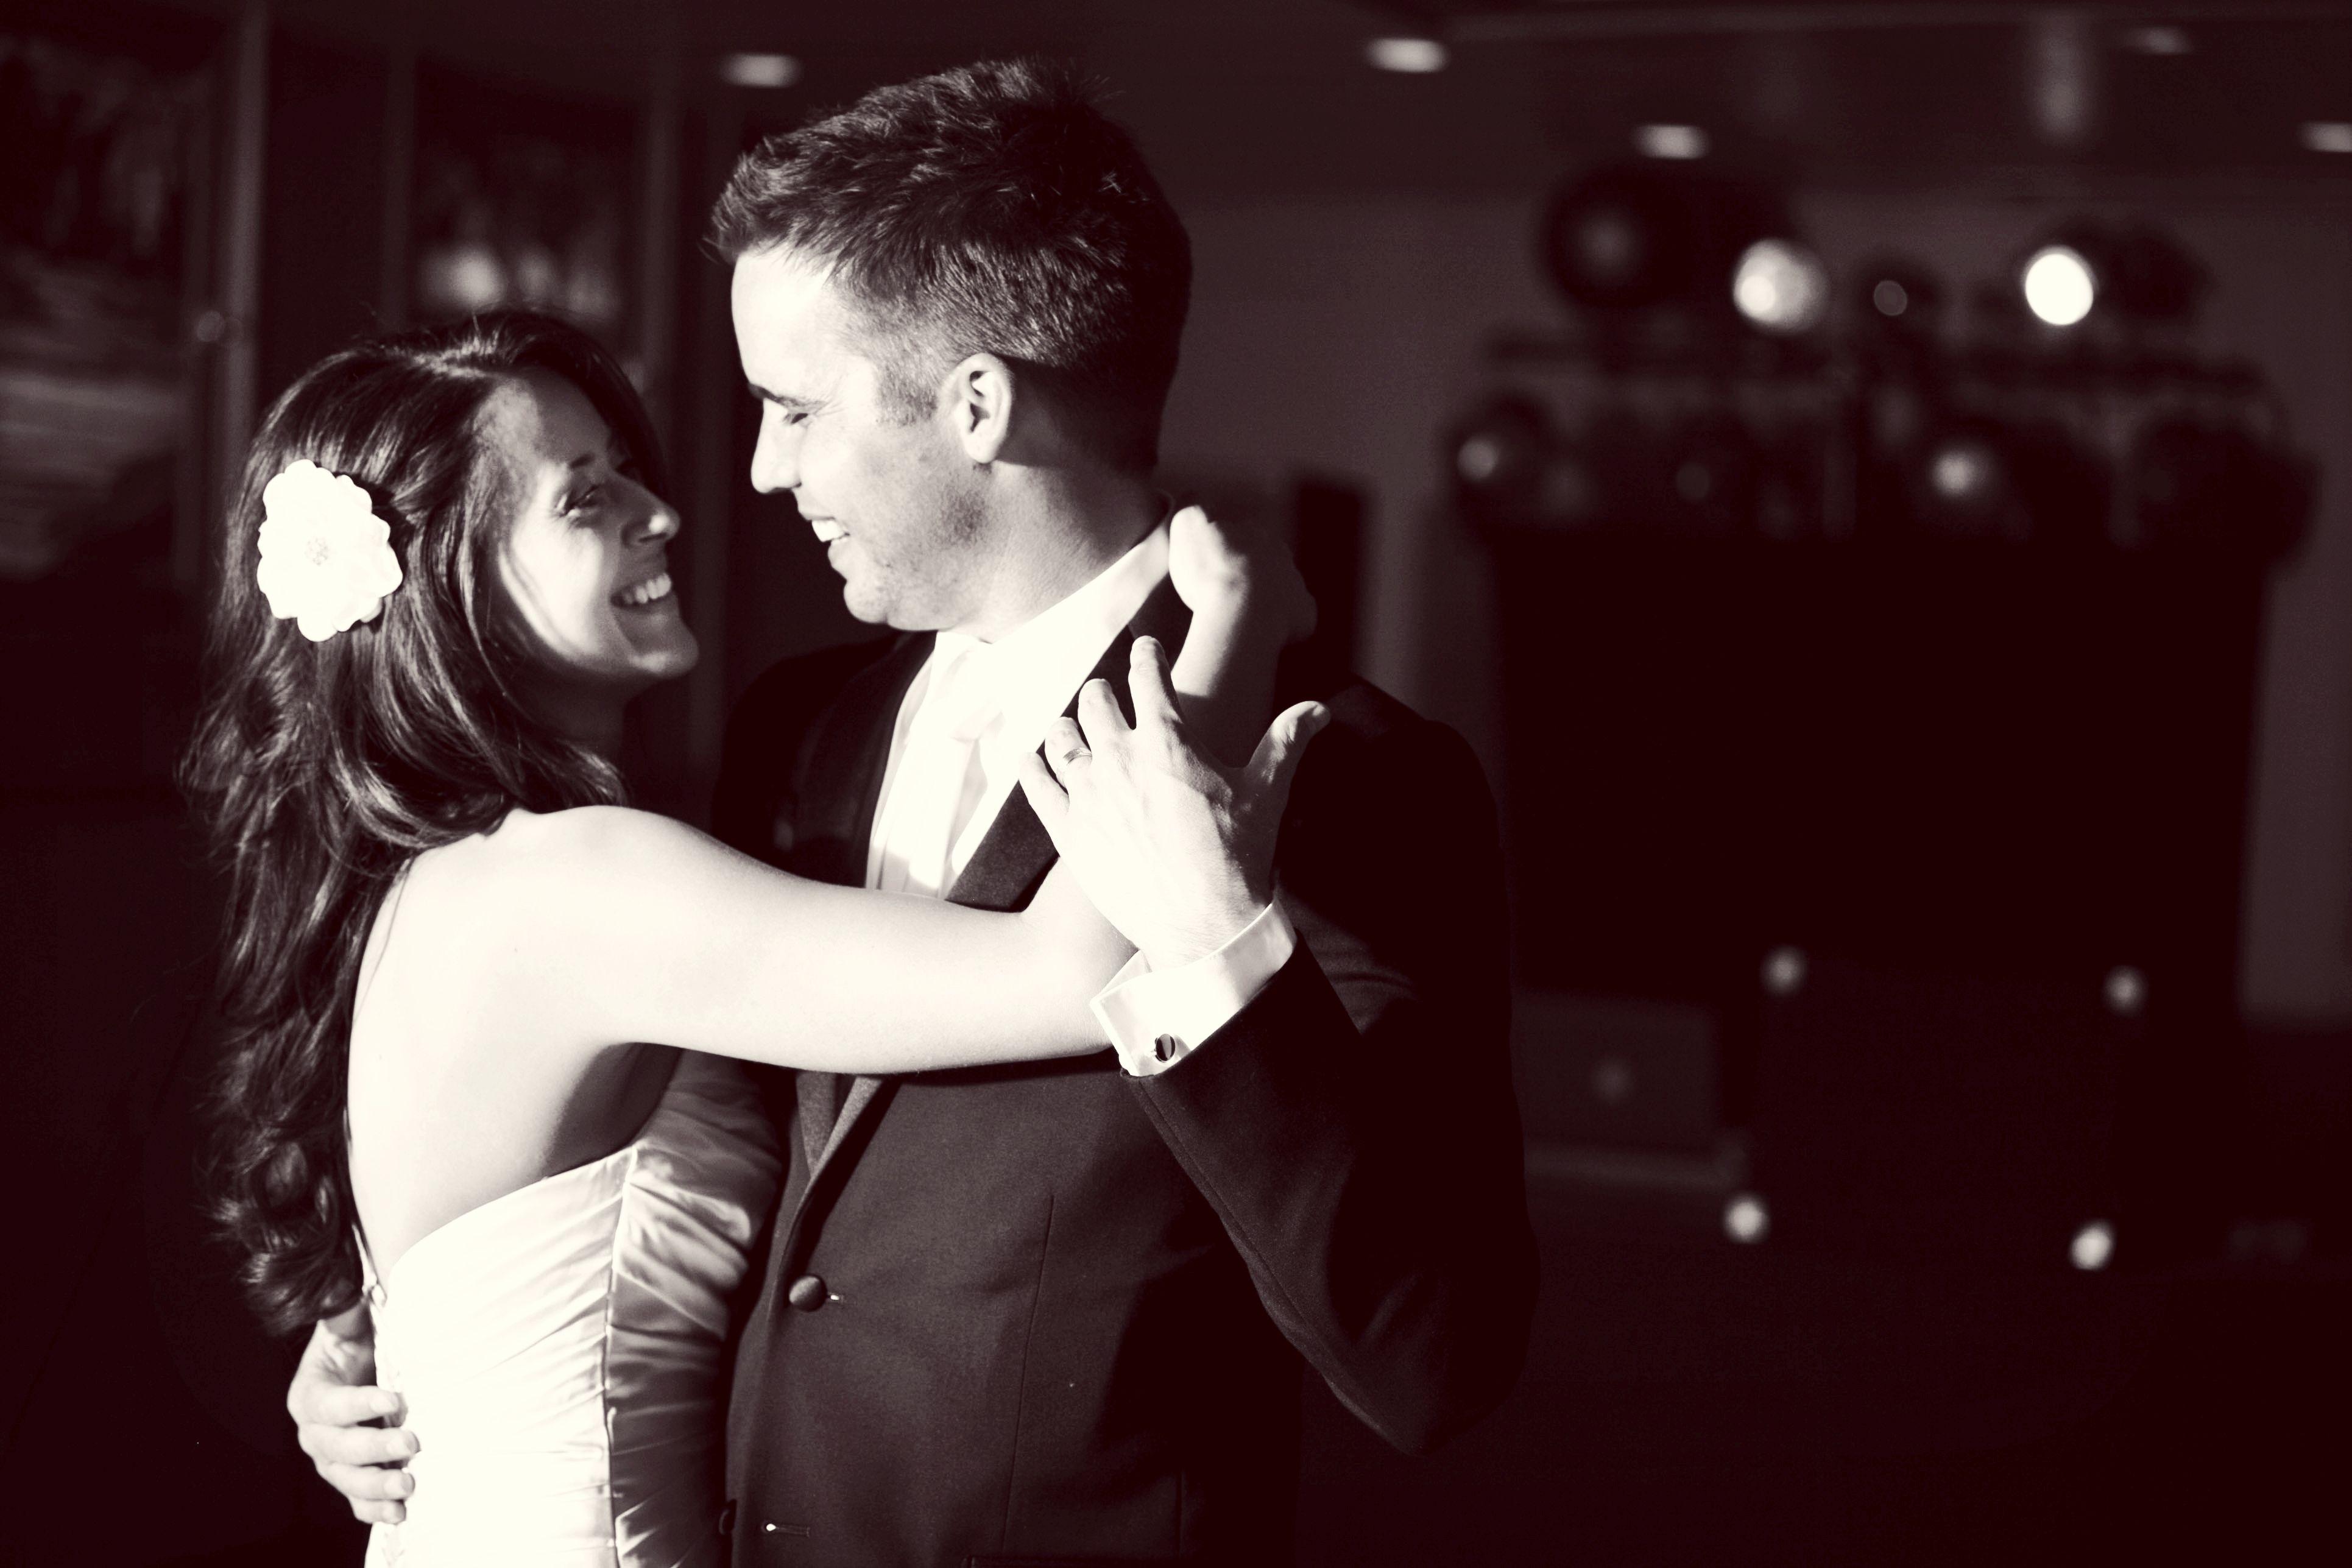 pure joy! #WeddingPhotographer #Minnesota #Wedding Photo by Ashley